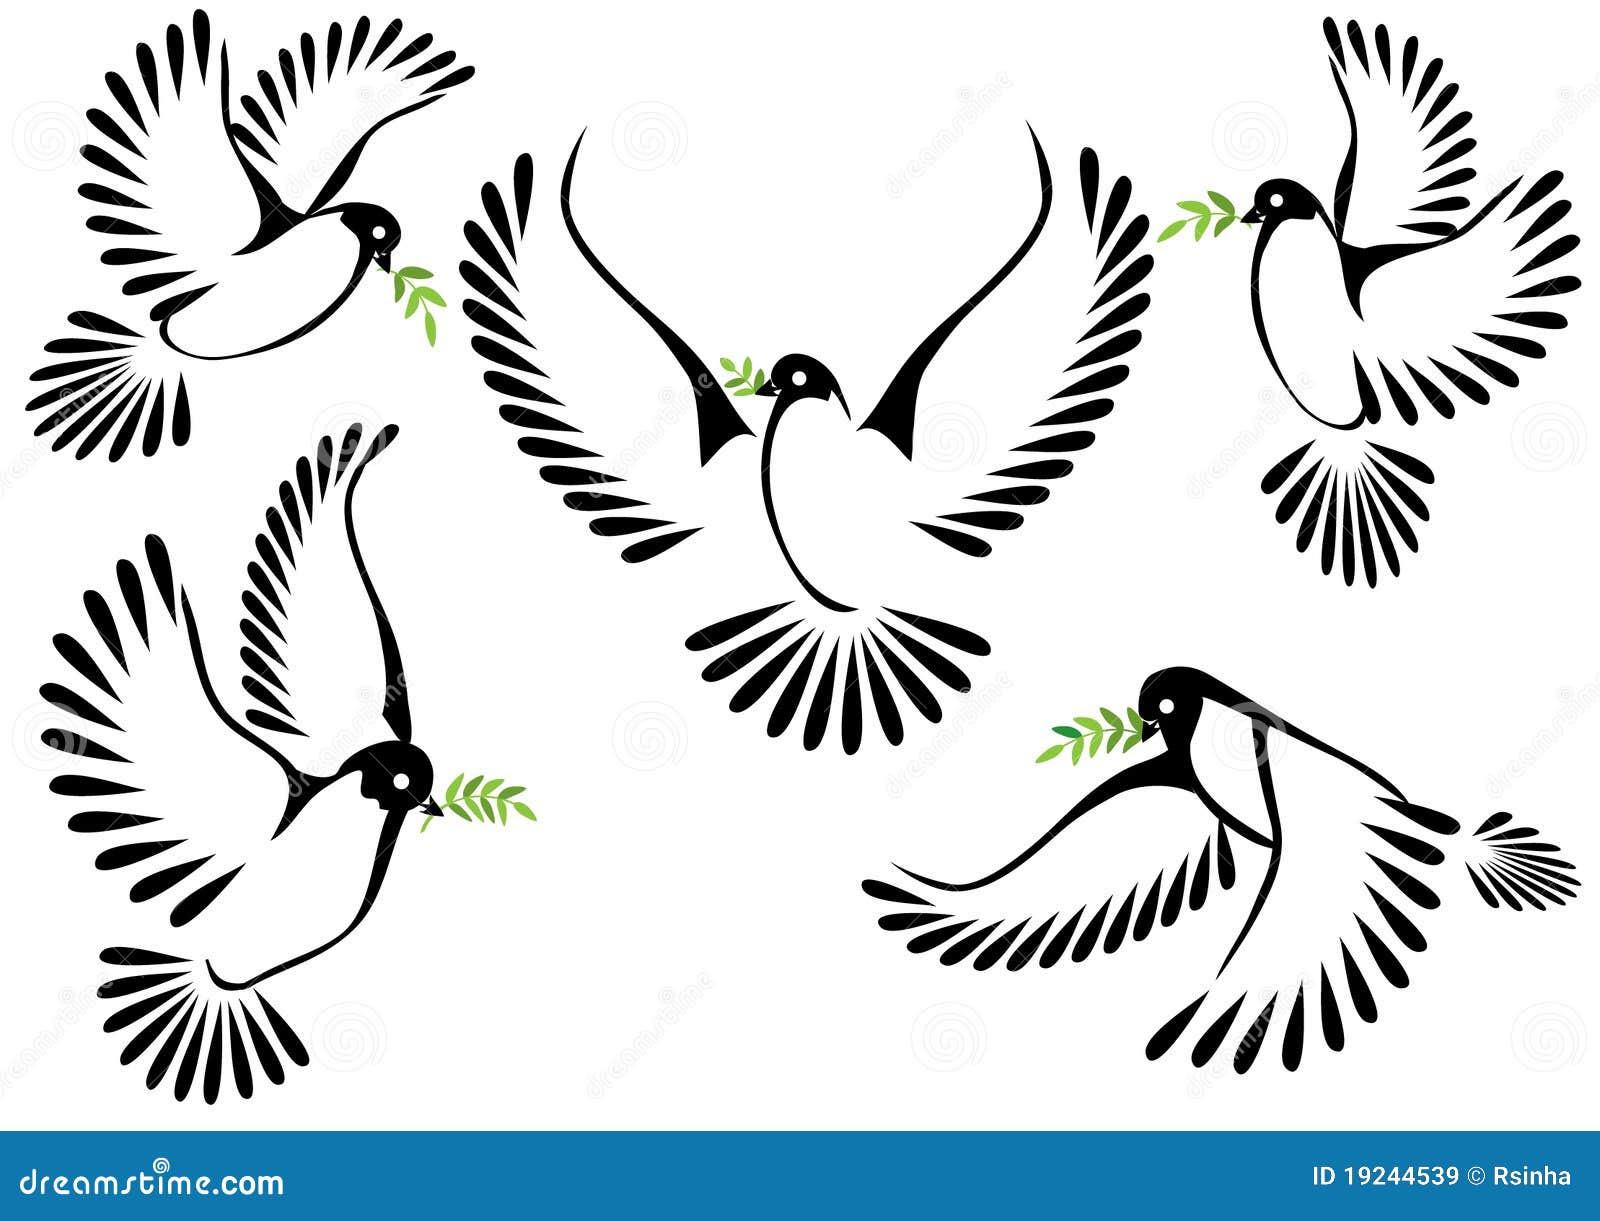 Hakuna Matata Symbol Drawing 20239 Usbdata